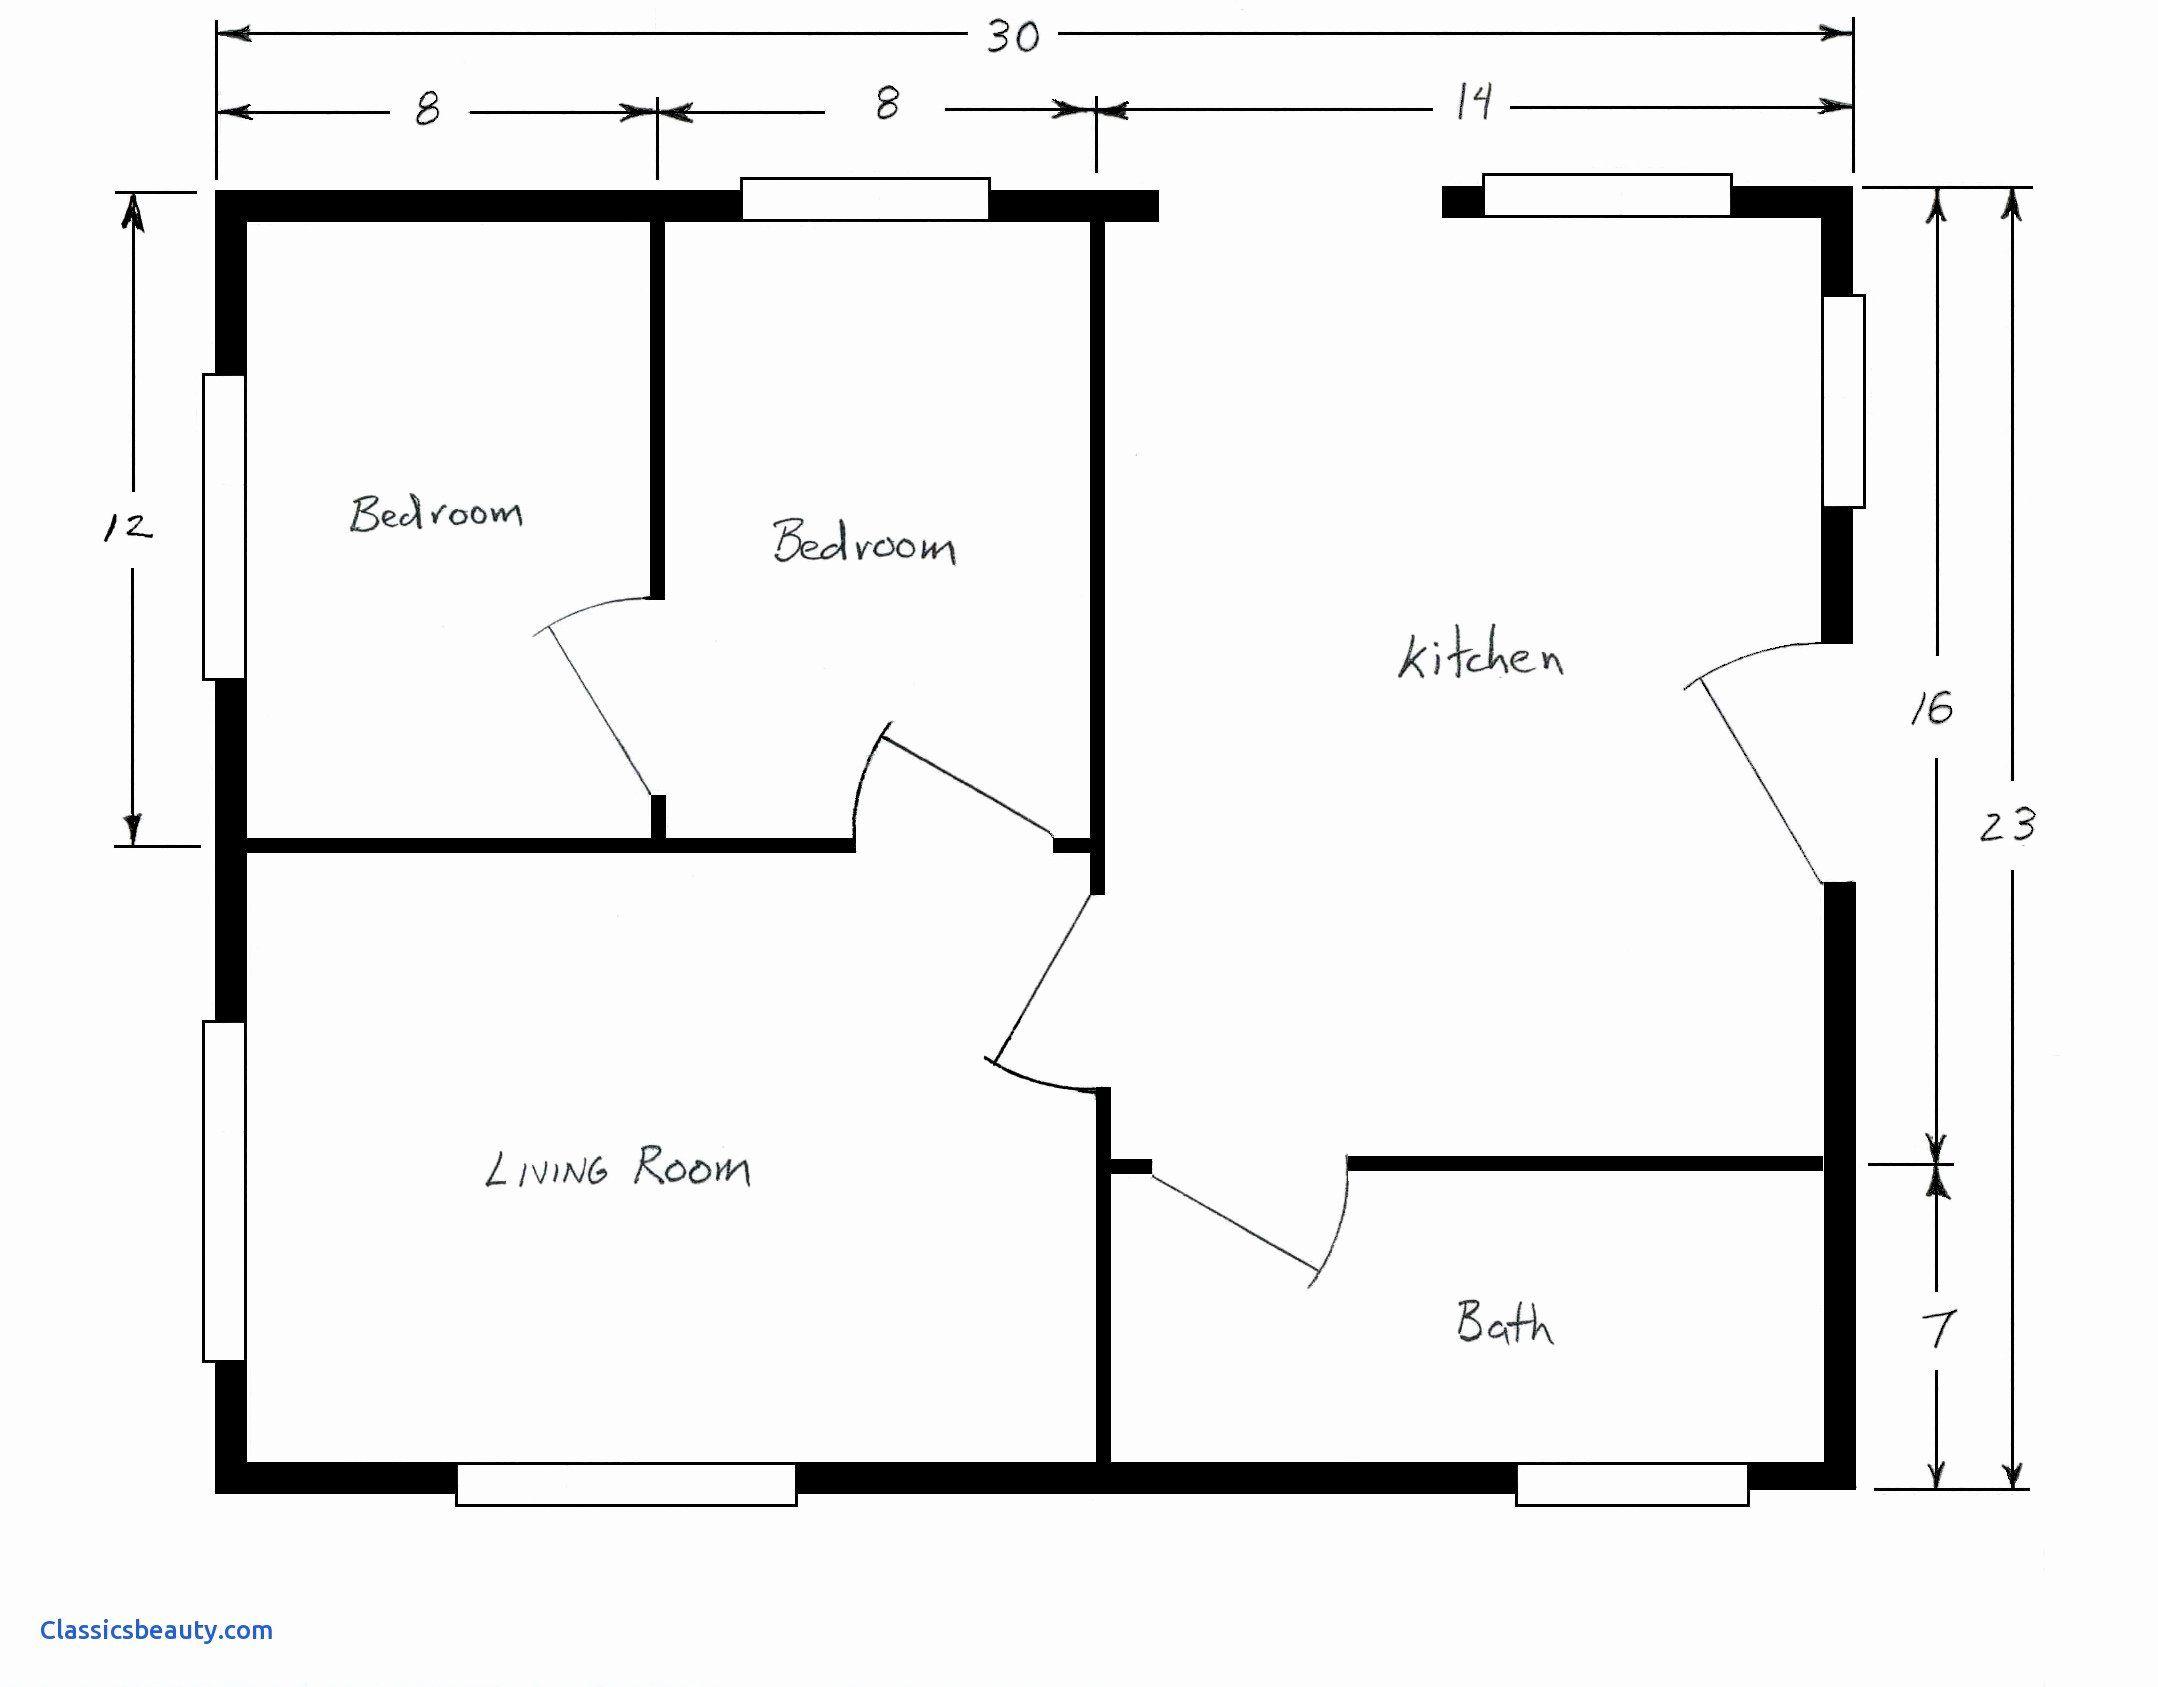 Warehouse Floor Plan Template Best Of Simple Floor Plan Elegant Blank House Floor Plan Template In 2020 Free Floor Plans Simple Floor Plans Floor Plans